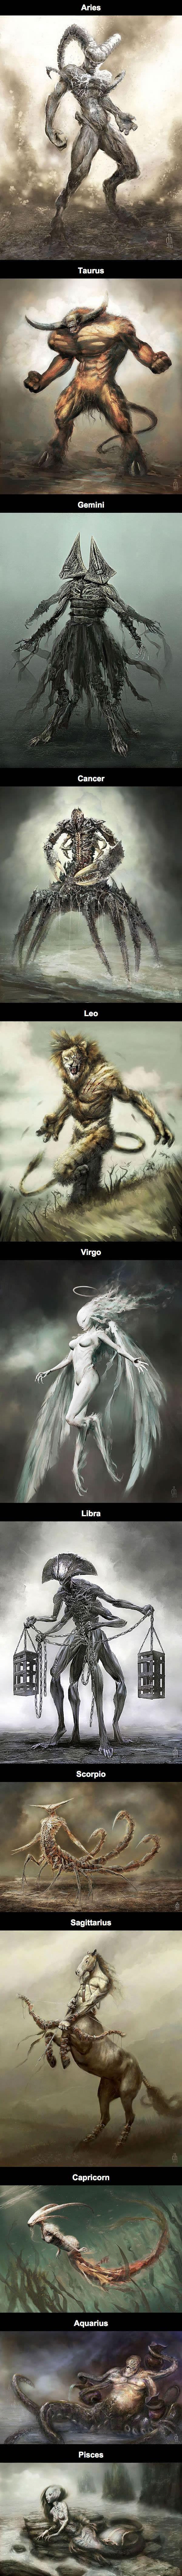 Awesome Zodiac drawings (By Damon Hellandbrand)